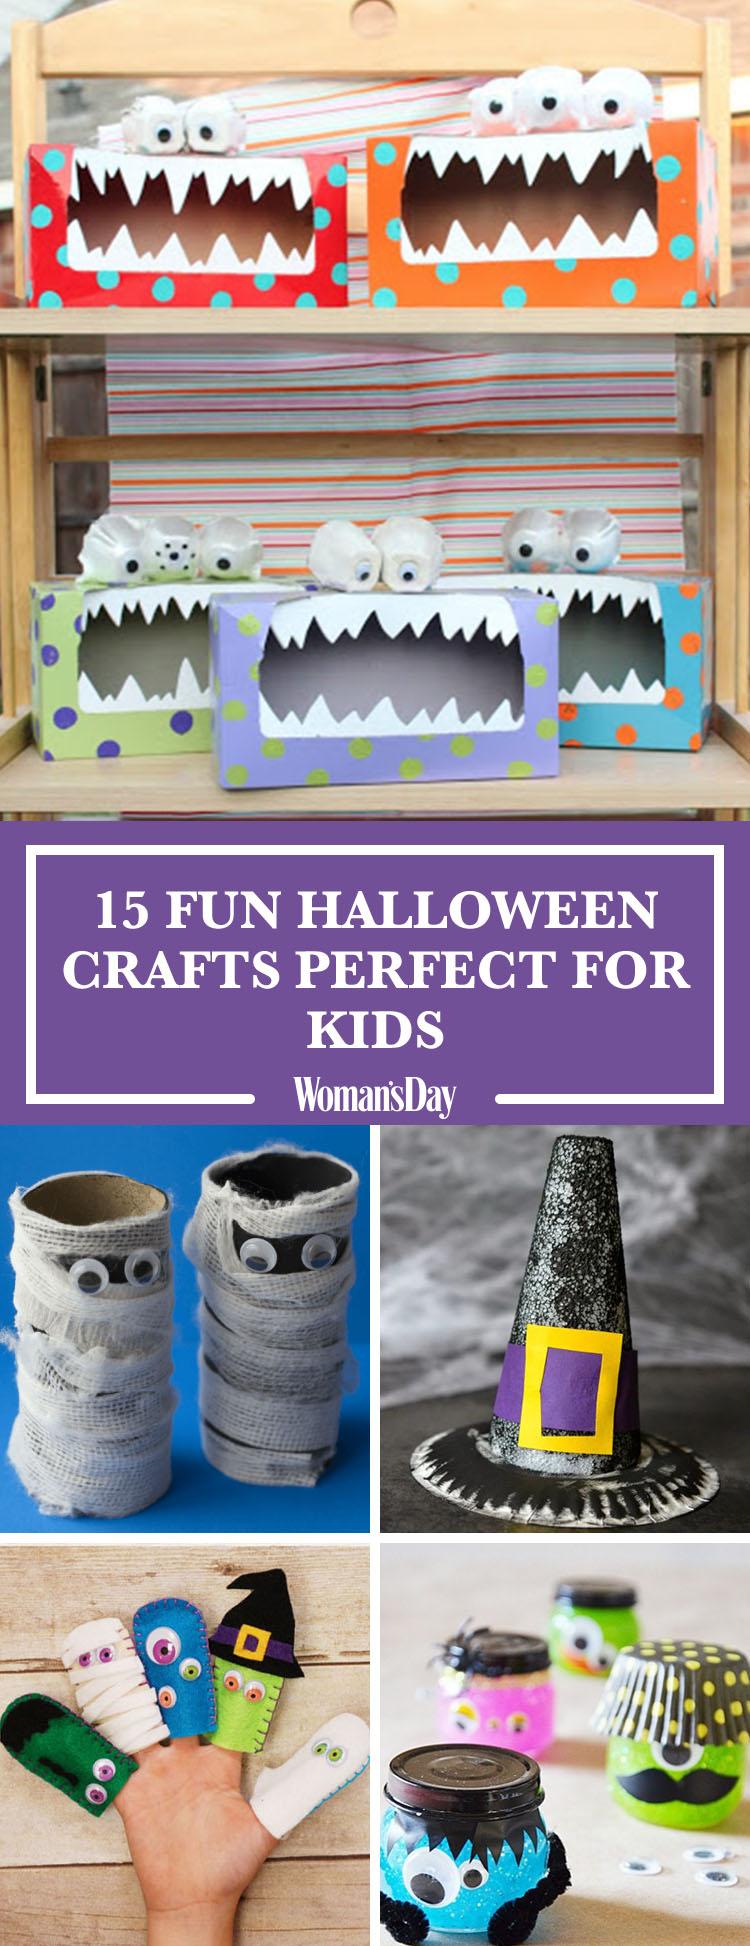 Best 25 Healthy Food For Children Ideas On Pinterest Auto Outside Ac Fan Motor Wiring N859bs 20 Easy Halloween Crafts Kids